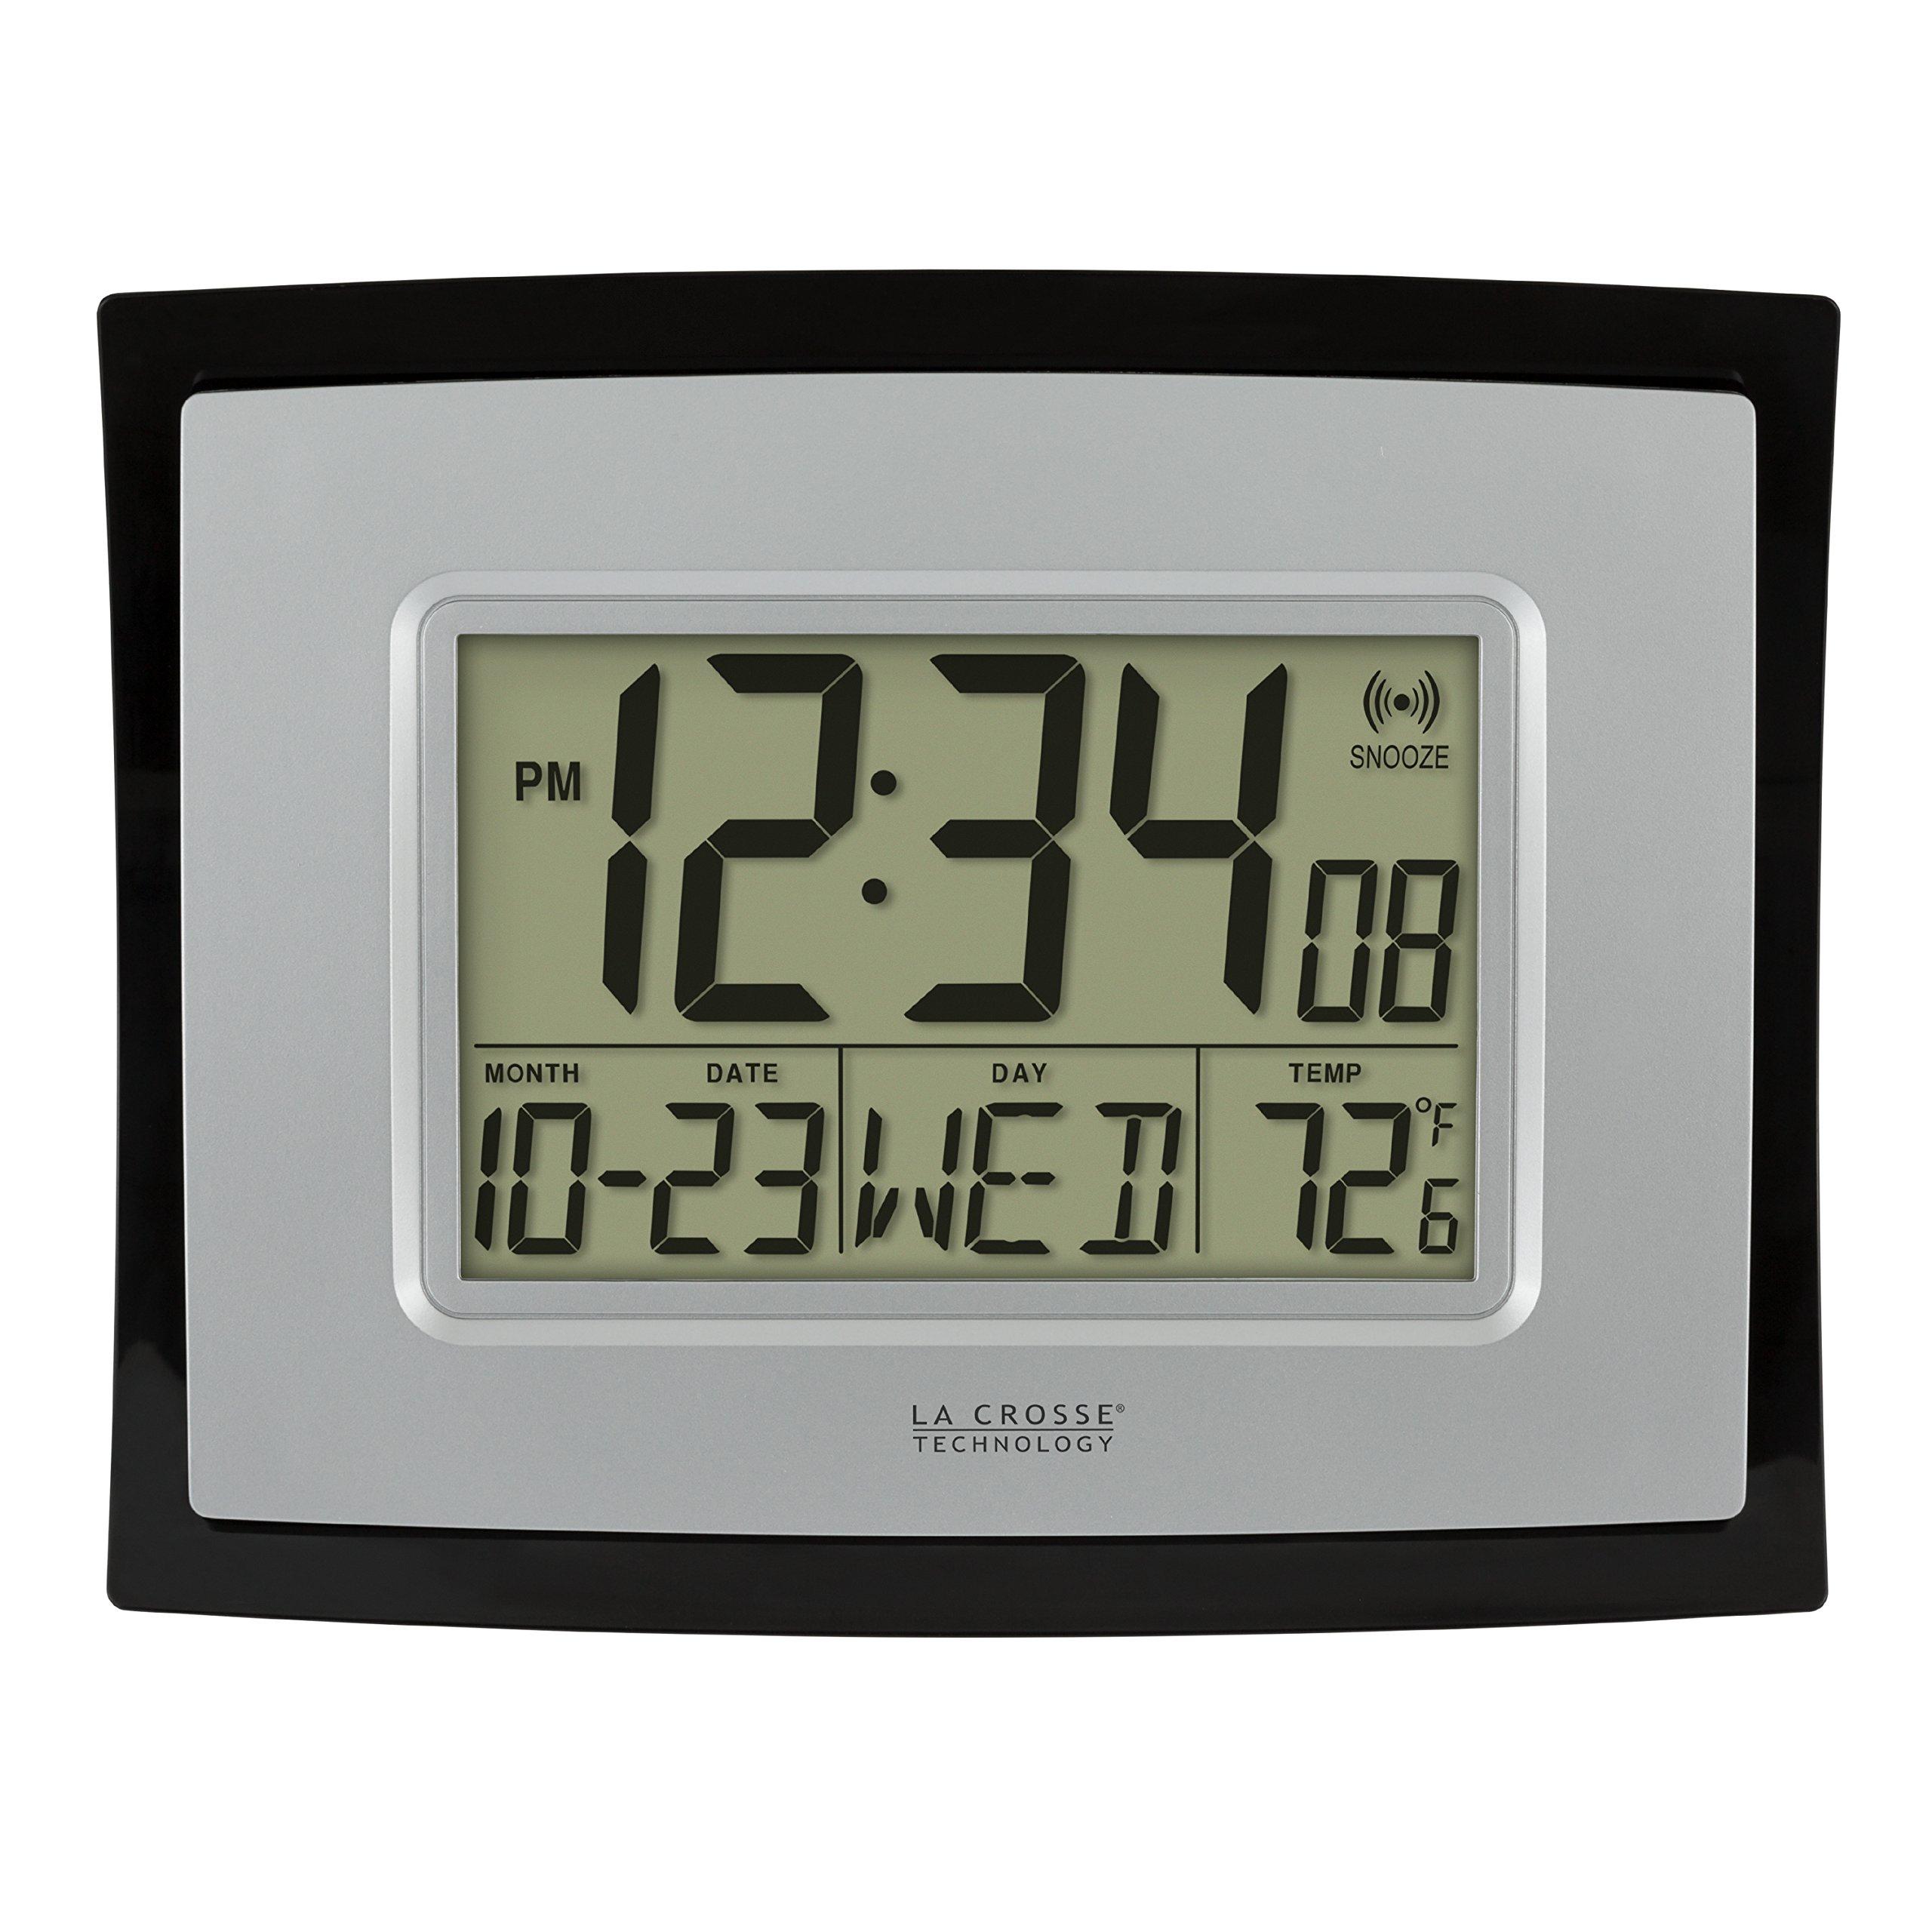 Amazon.com: La Crosse Technology WT-8002U Digital Wall Clock: Home & Kitchen